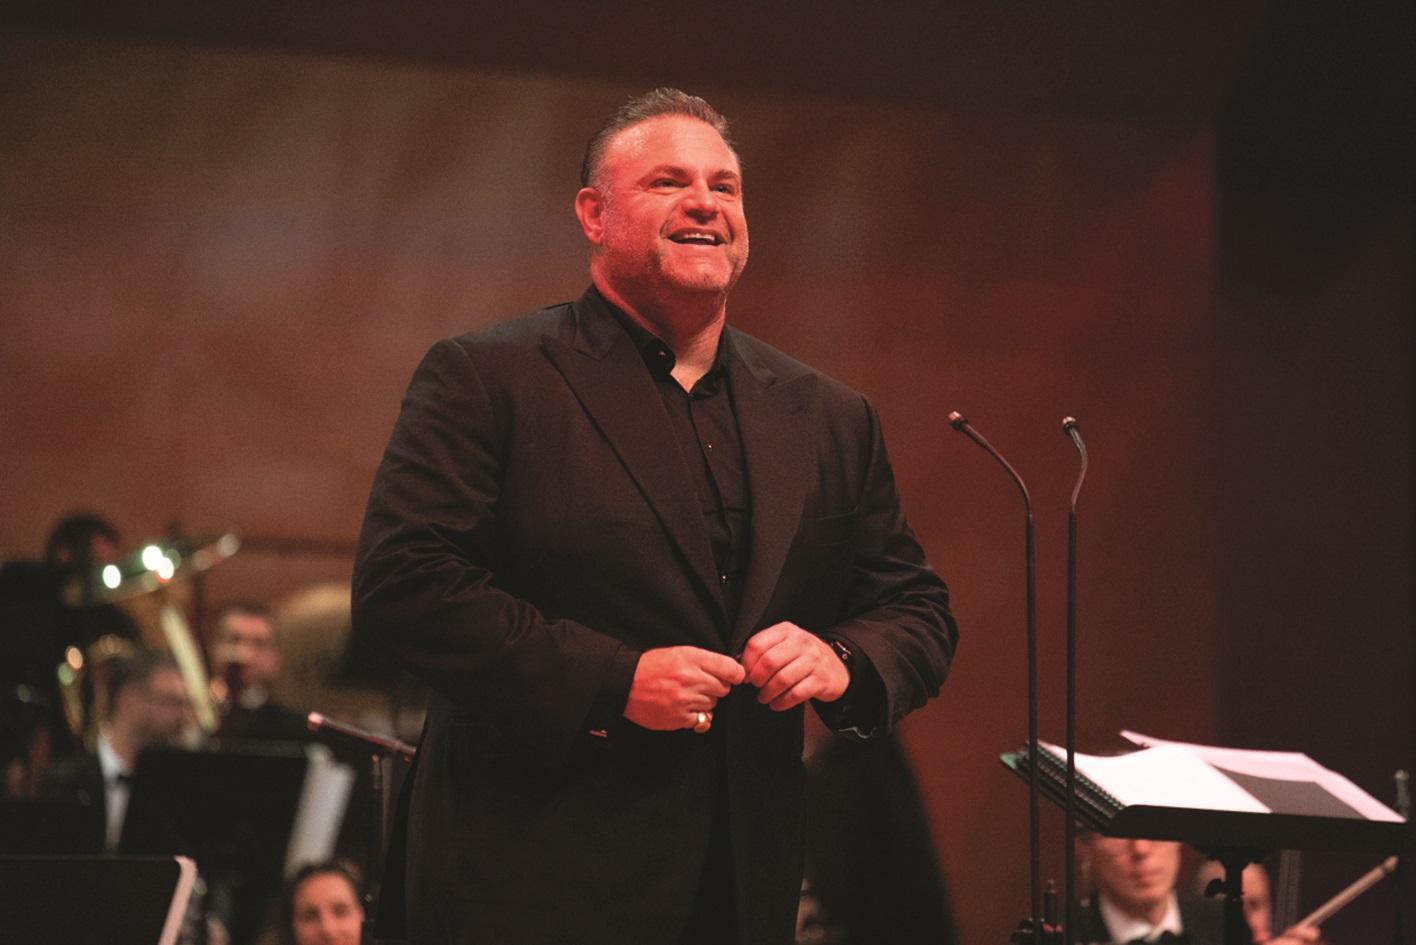 Tenor Joseph Calleja in concert. Photo: Evgeny Evtyukhov